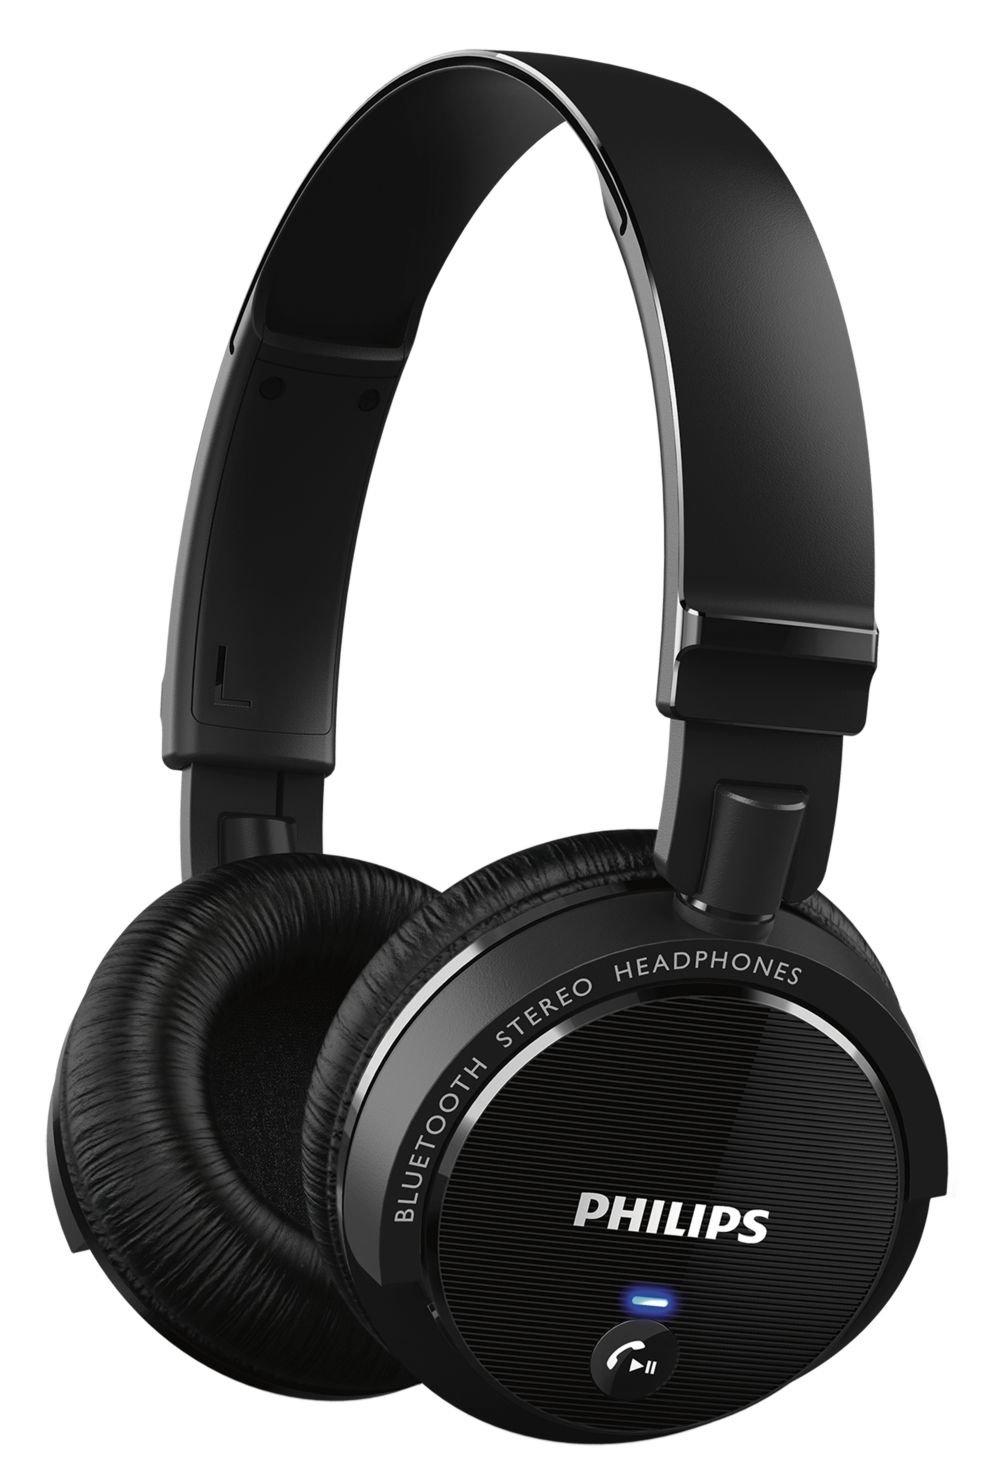 Philips Wireless Bluetooth Headphones free shipping 380v avr kde12e3 kde15e3 kde20e3 generator spare parts suit for kipor kama automatic voltage regulator